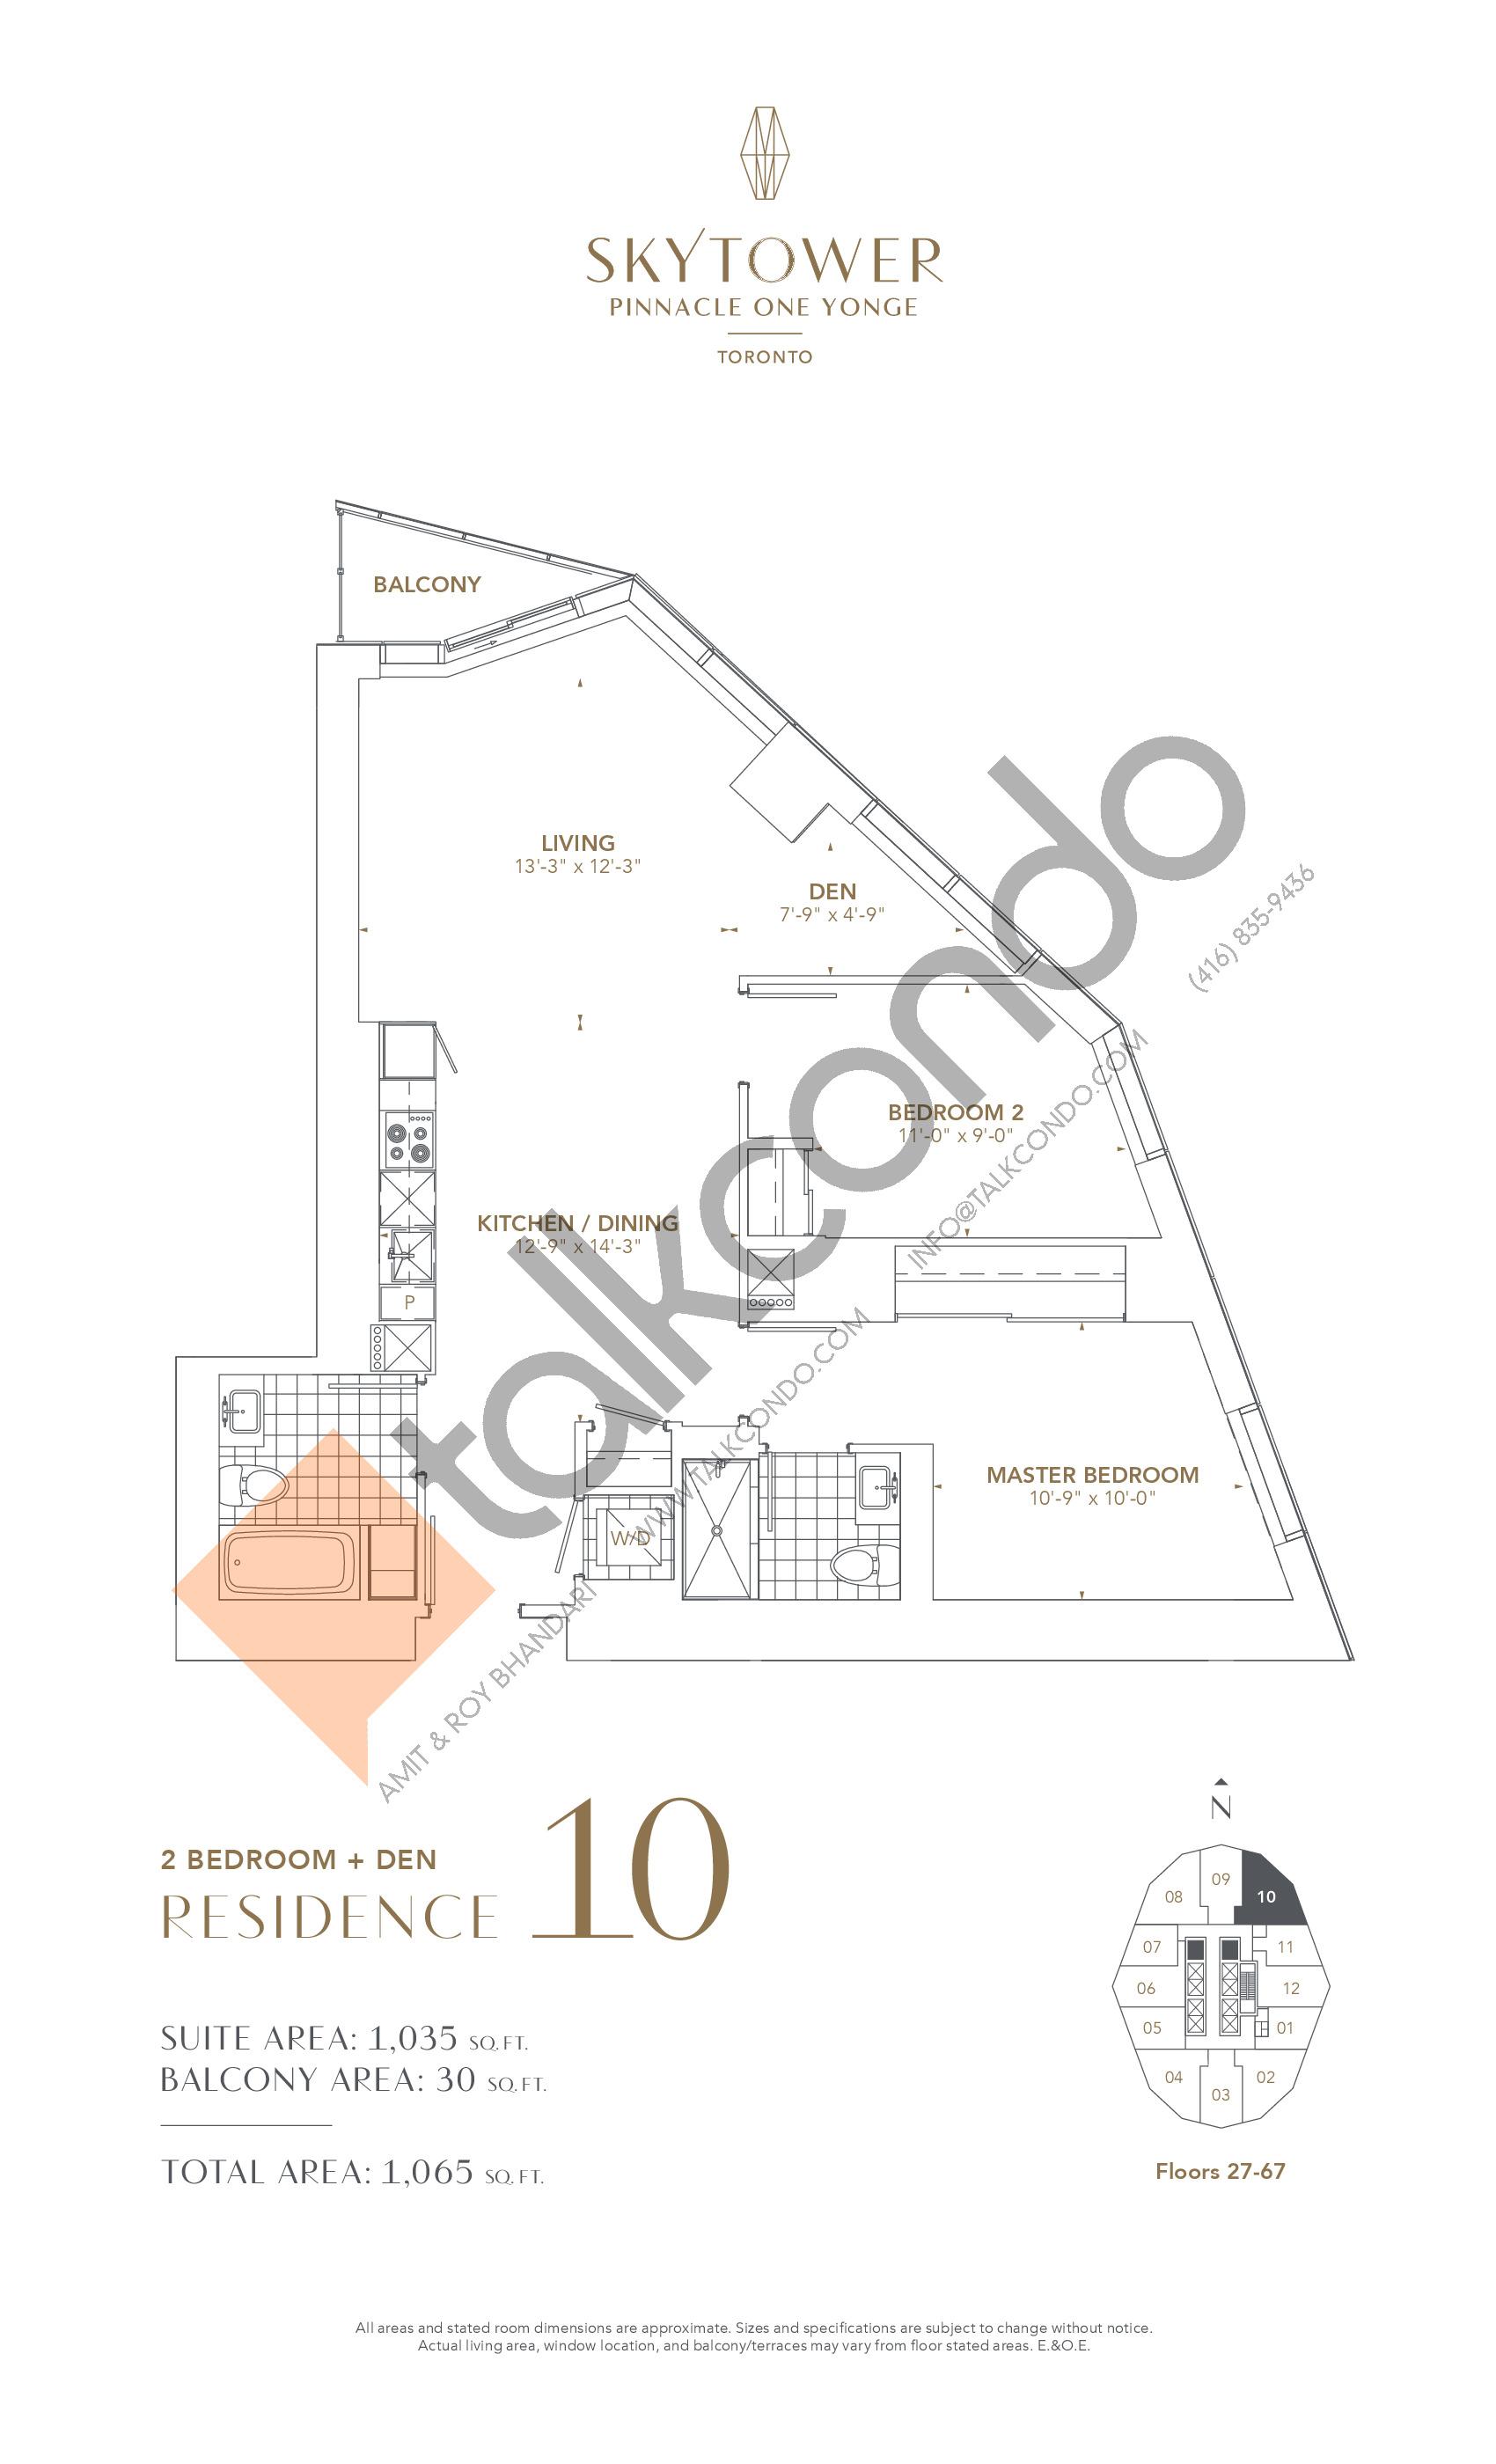 Residence 10 Floor Plan at SkyTower at Pinnacle One Yonge - 1035 sq.ft